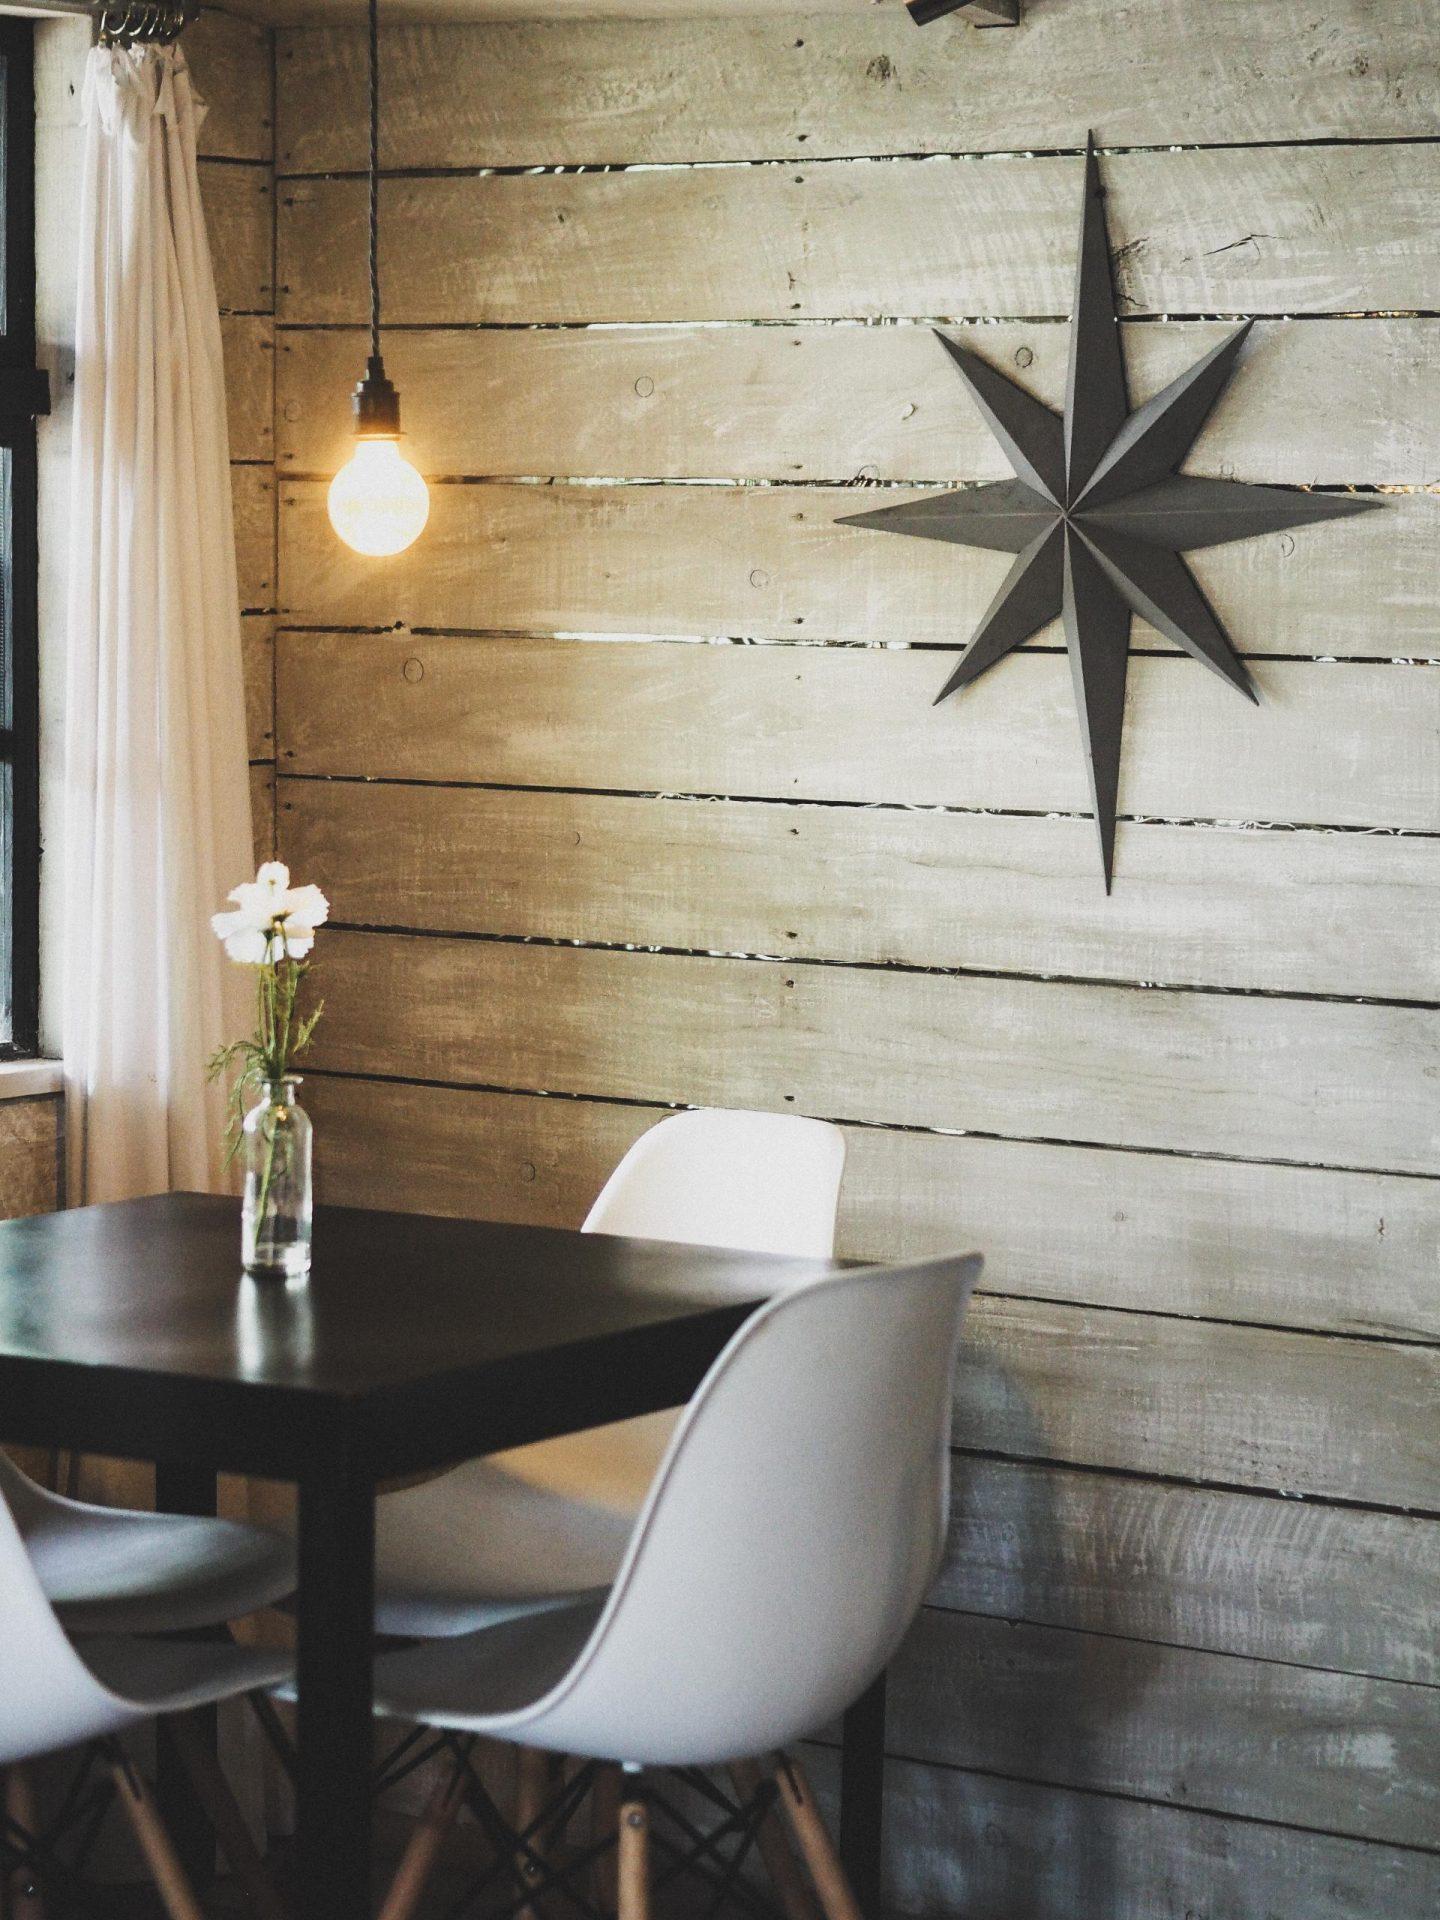 North Star Club, Sancton - The White Rose Suite - Rachel Nicole UK Travel Blogger